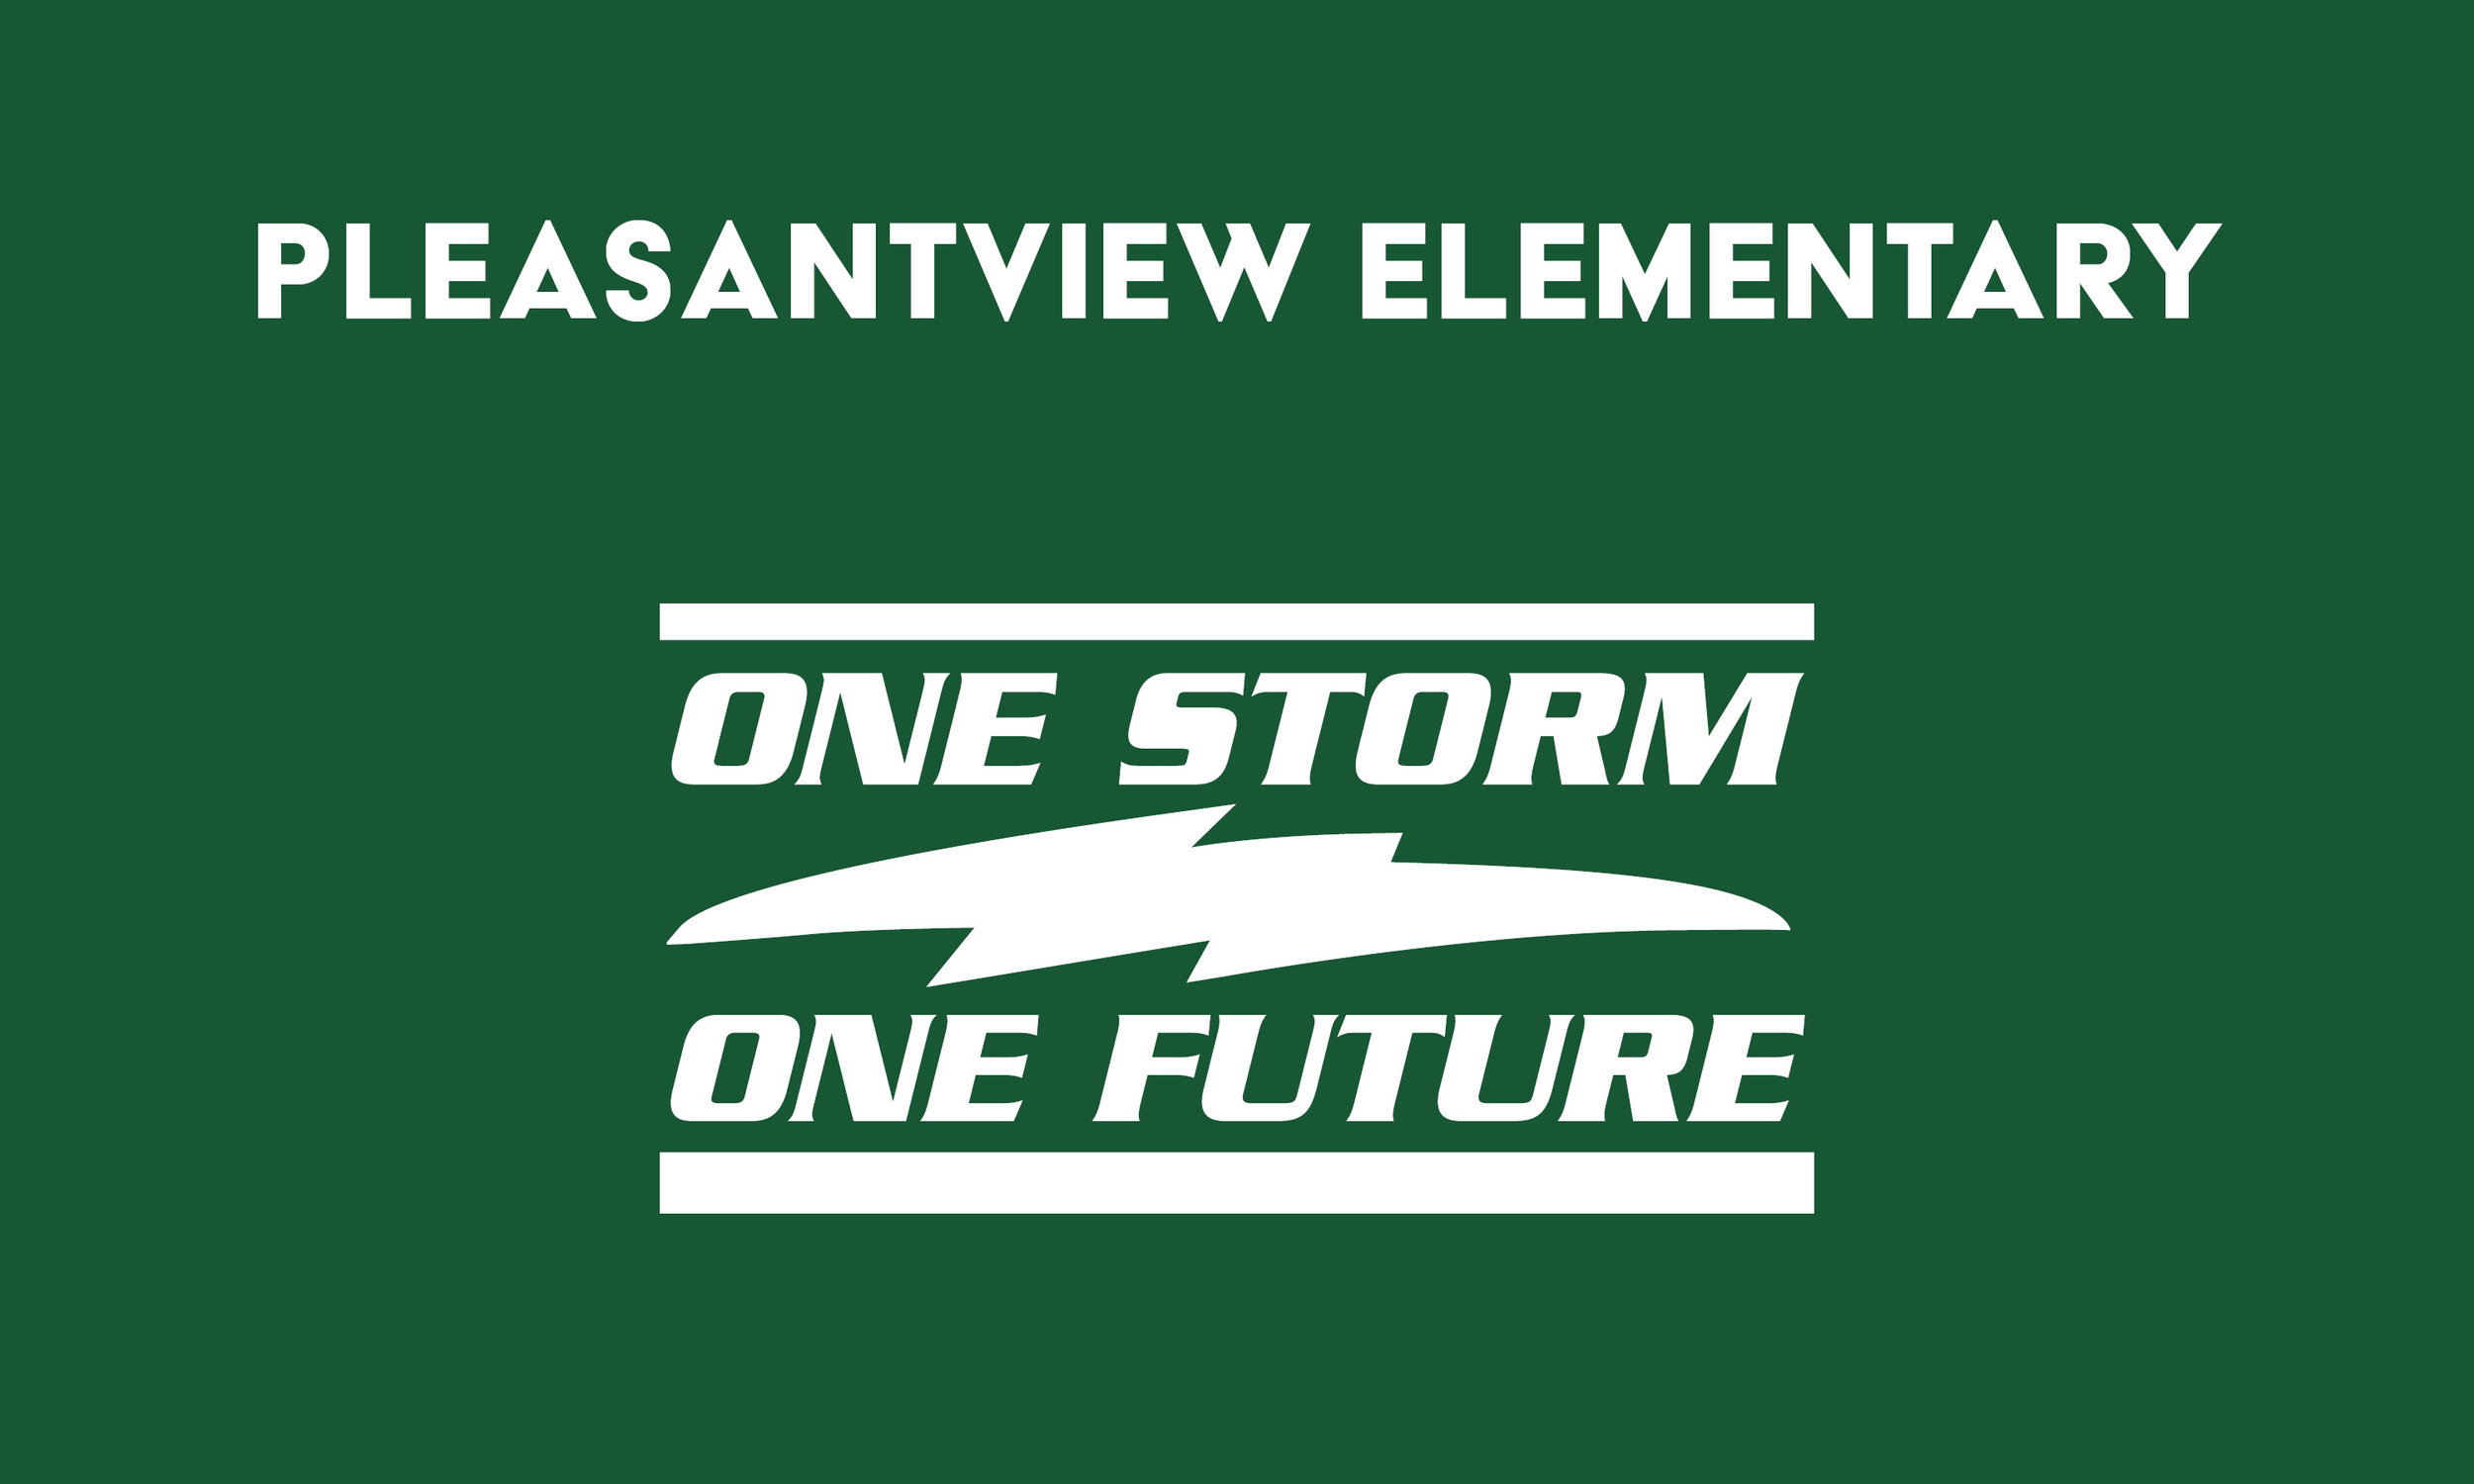 Pleasantview_Elementary_Graphic.jpg